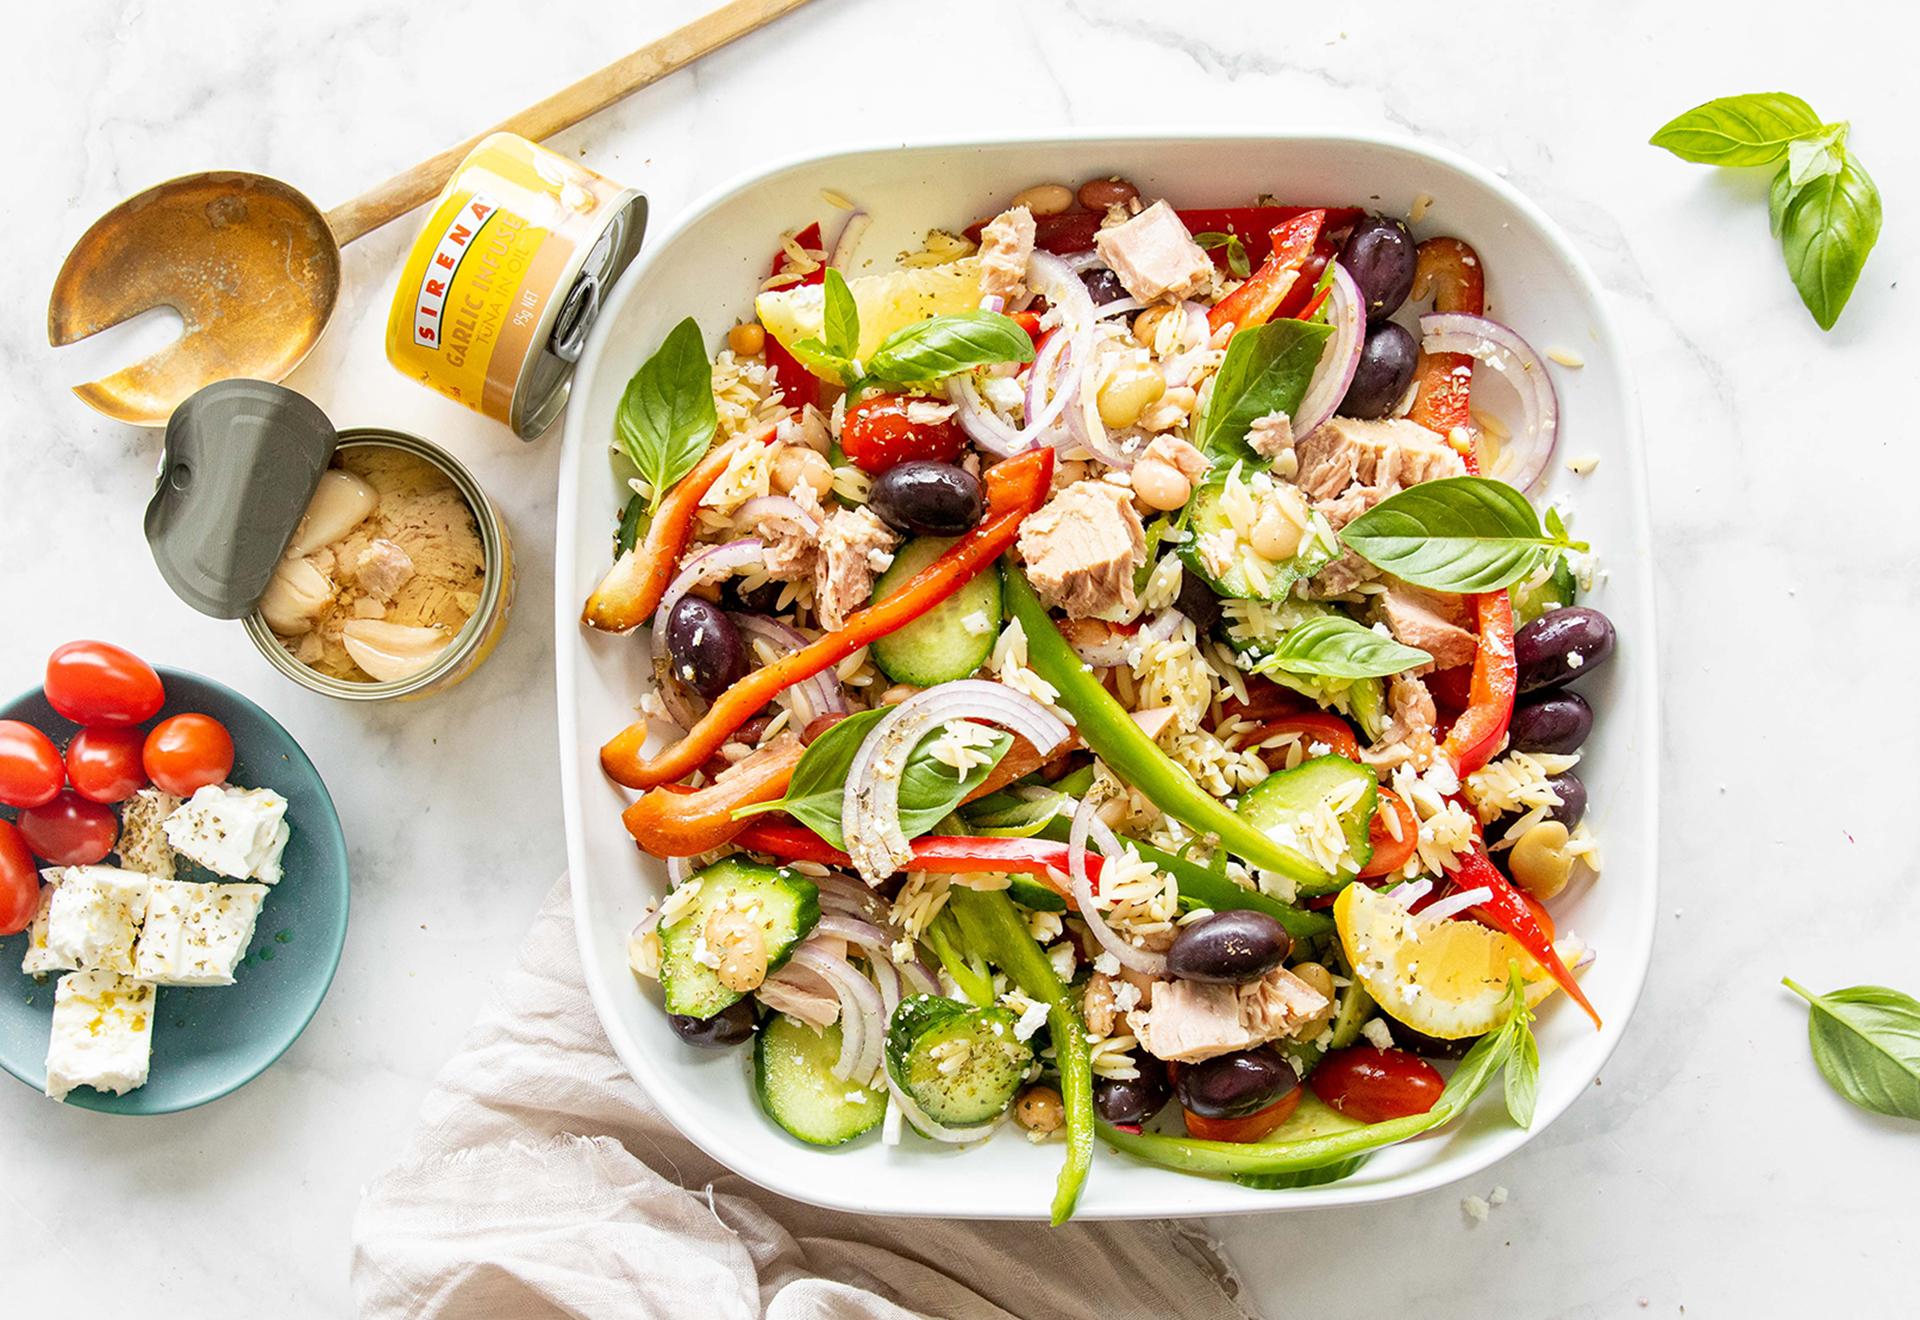 Leah Itsines' Greek Salad with Sirena Garlic Tuna & Risoni